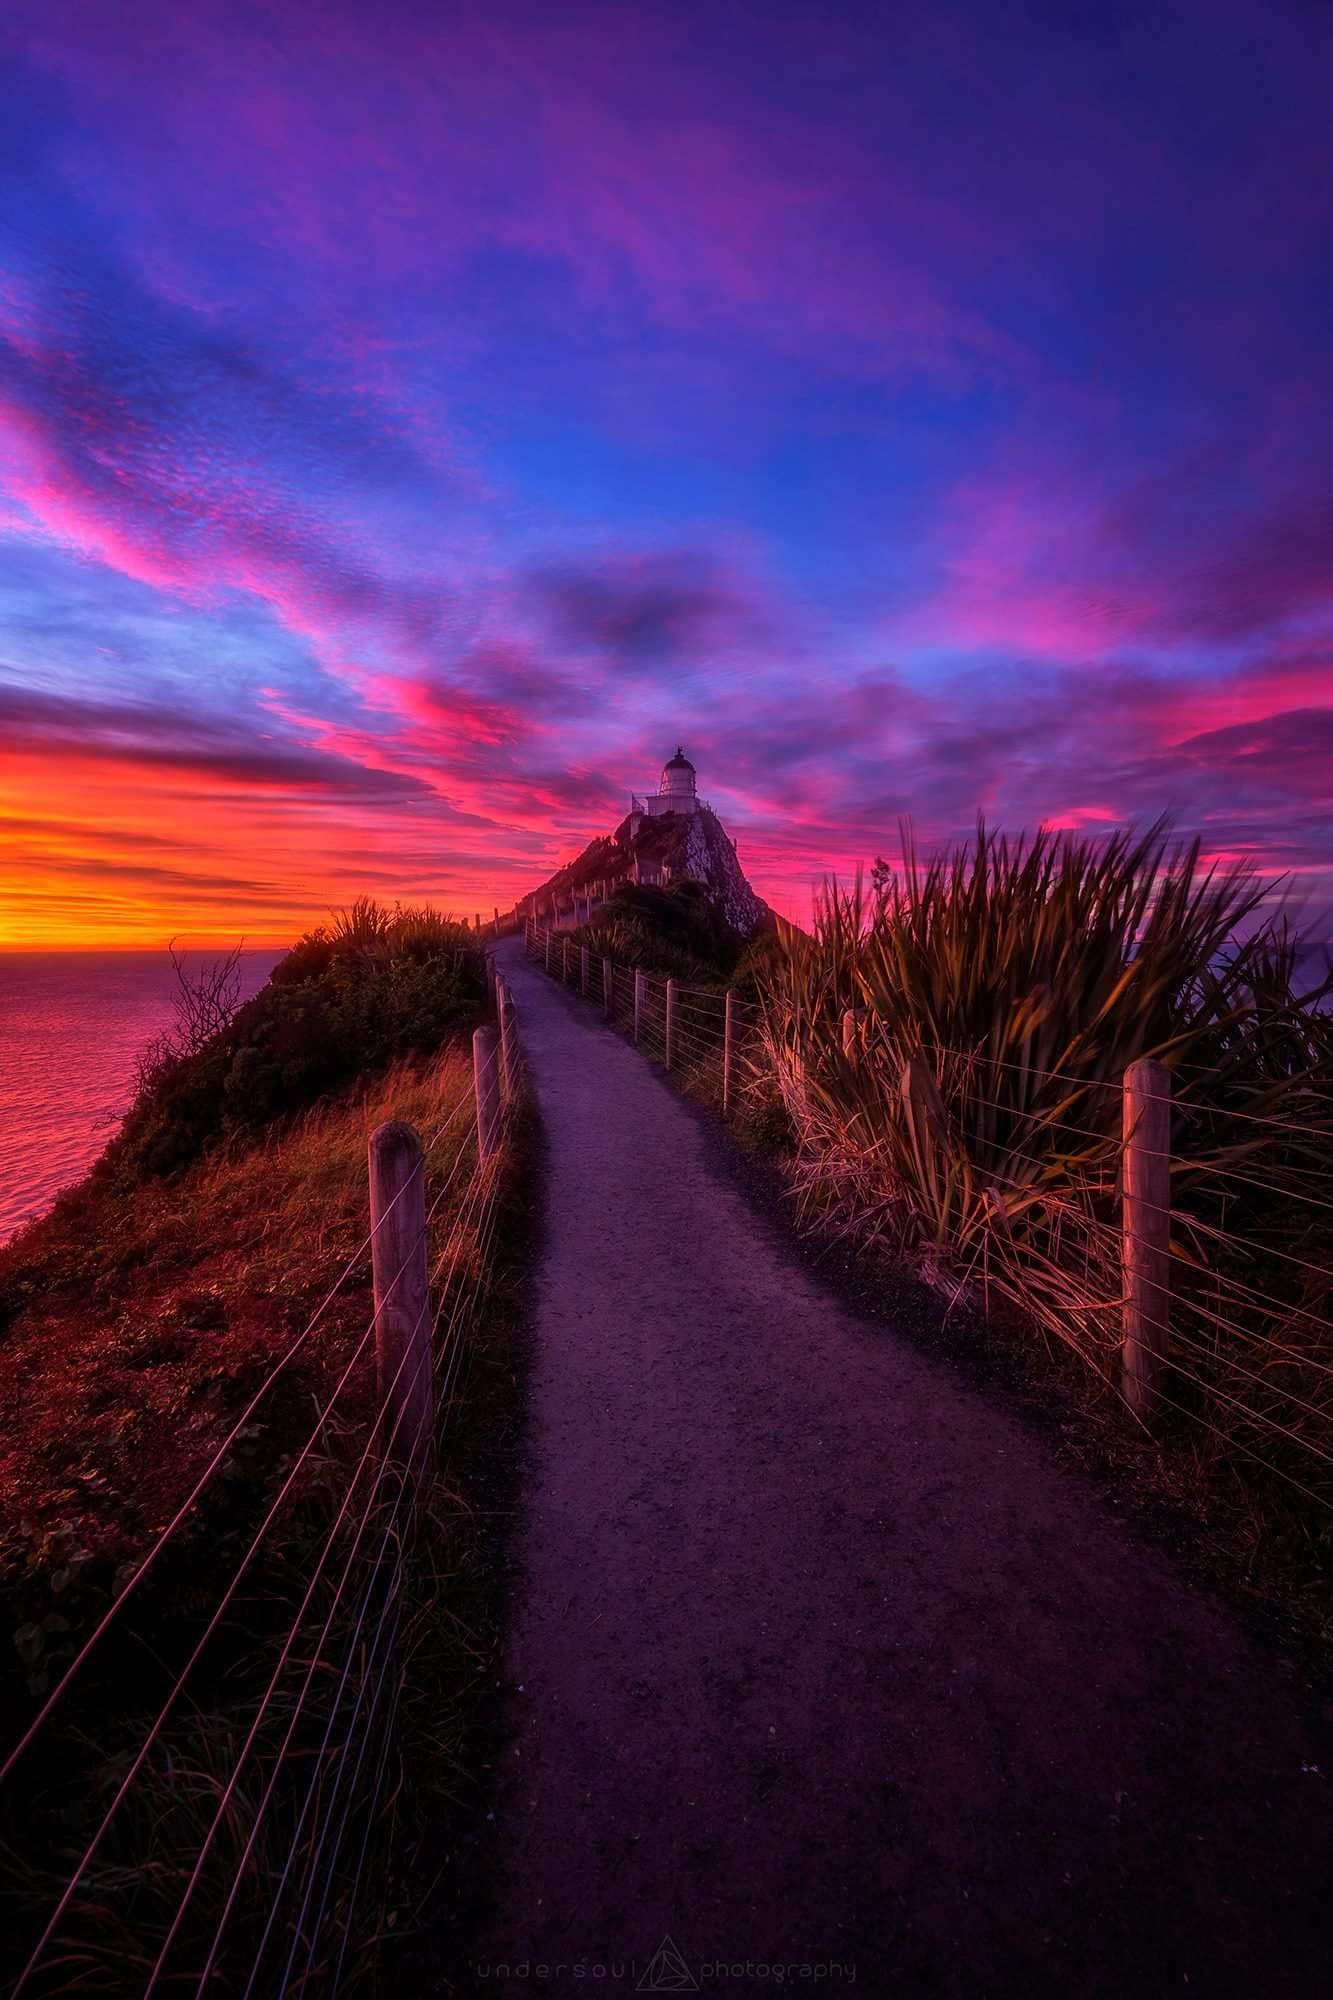 Undersoul Photography Scenic Photography Sunset Nature Landscape Photography